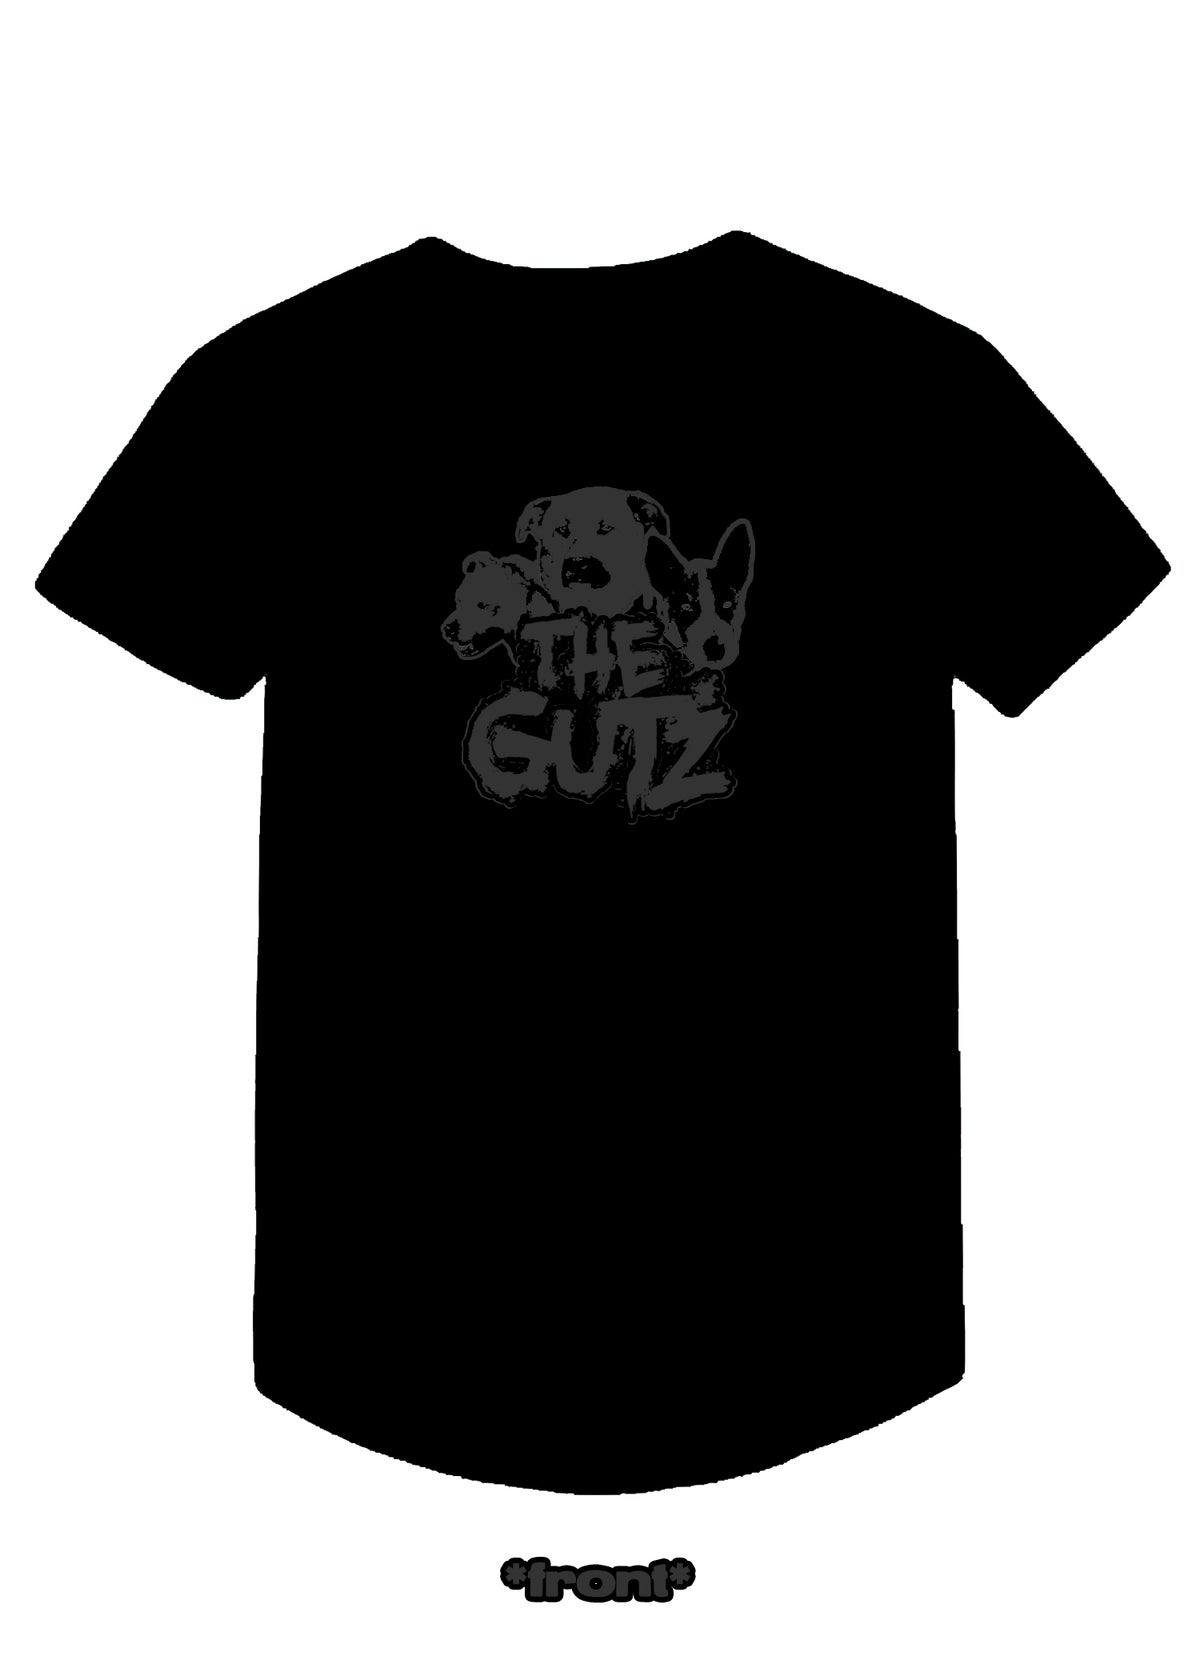 "Image of The Gutz ""The Gutz's Muttz"" T-Shirt"